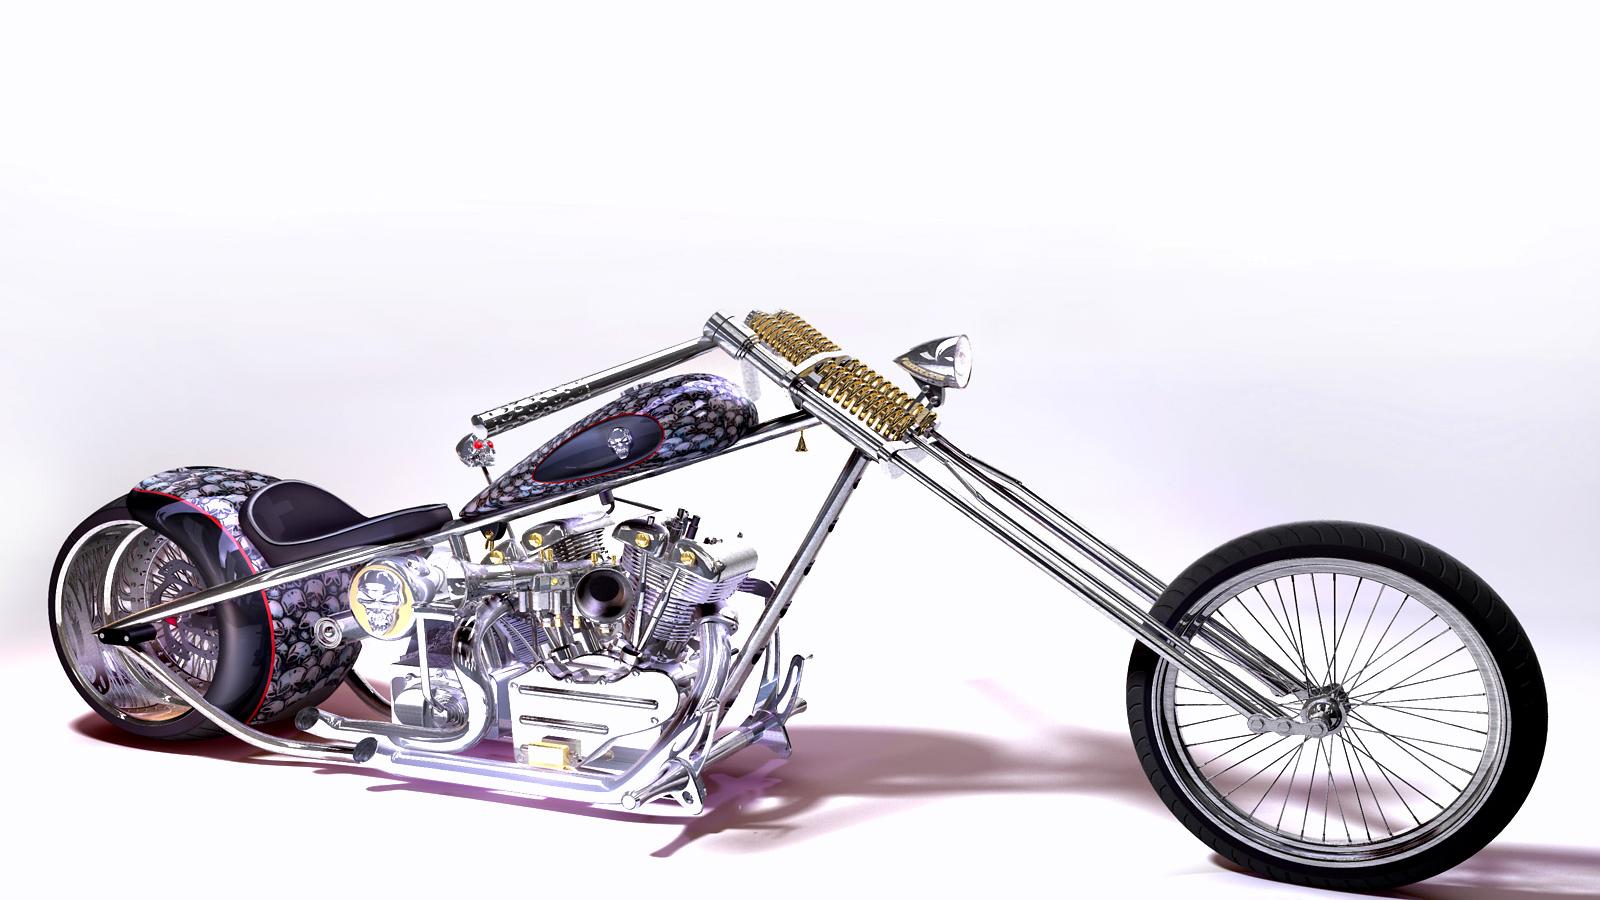 Free Download Free 3d Bike Motor Bike Wallpapers Download